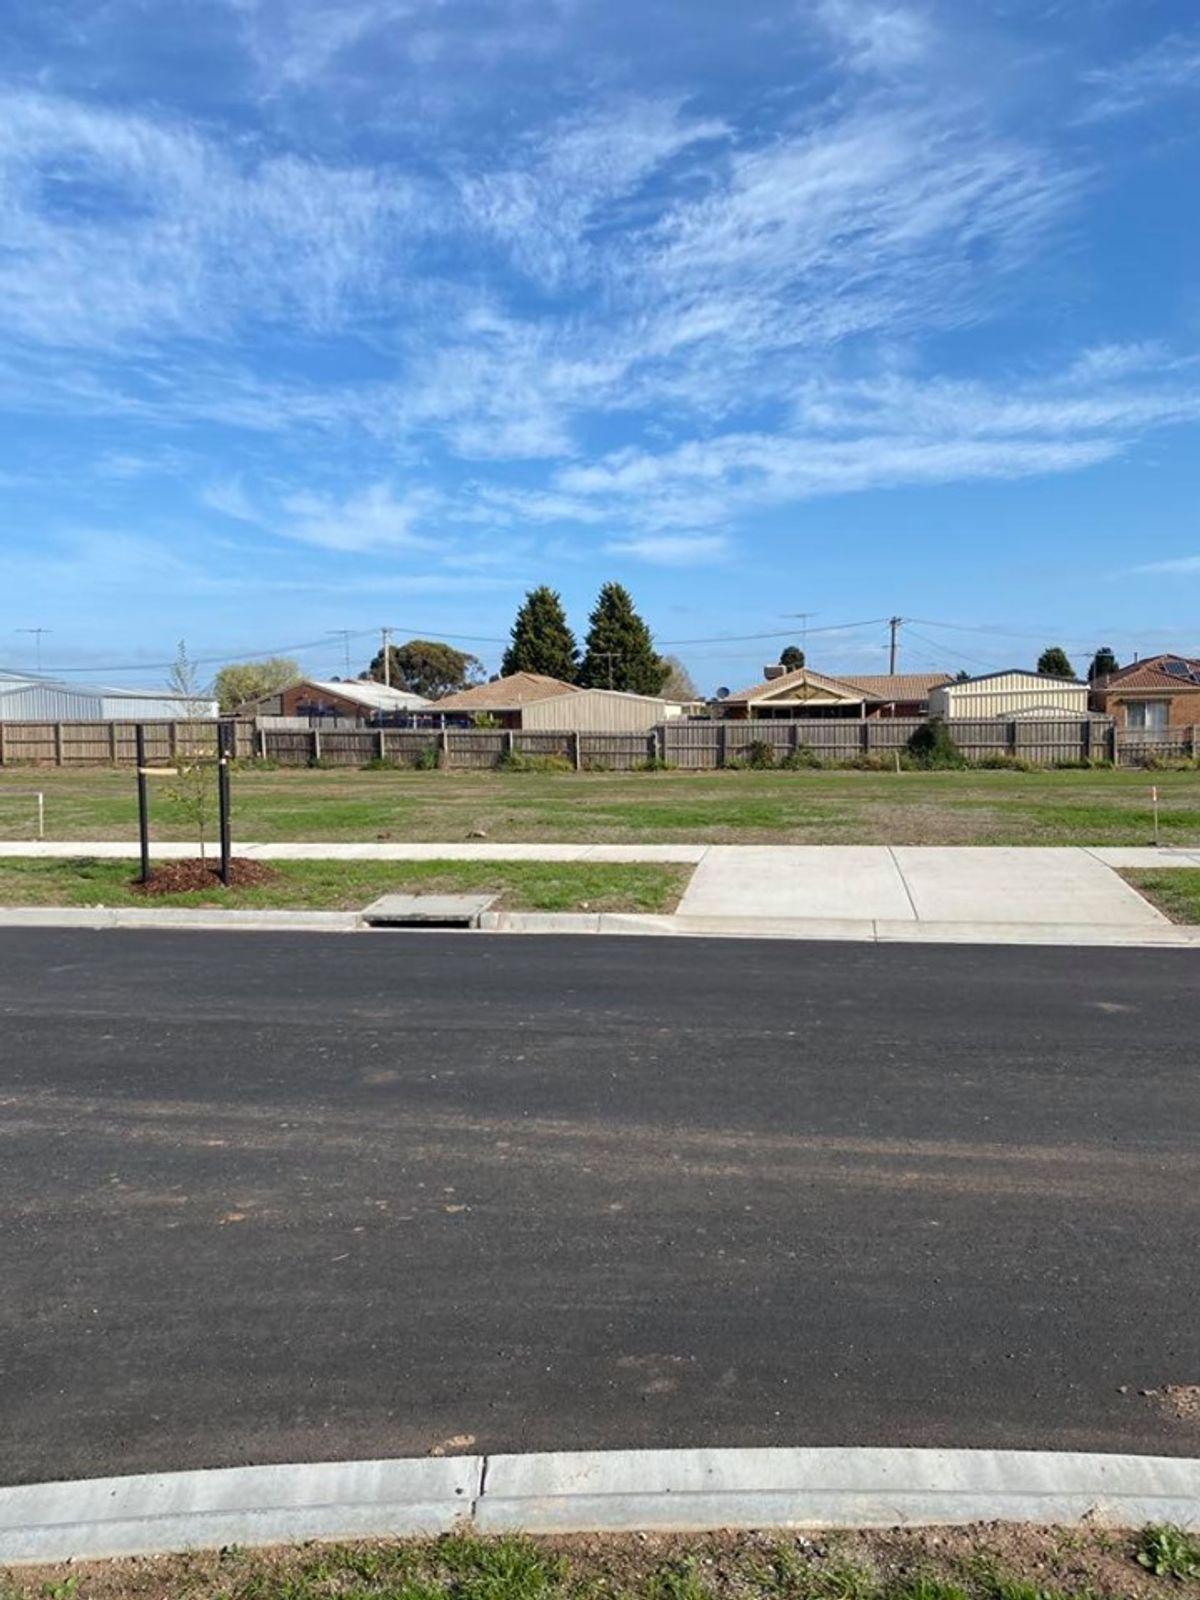 Lot 1305/36 Blackwood Drive, Lara, VIC 3212